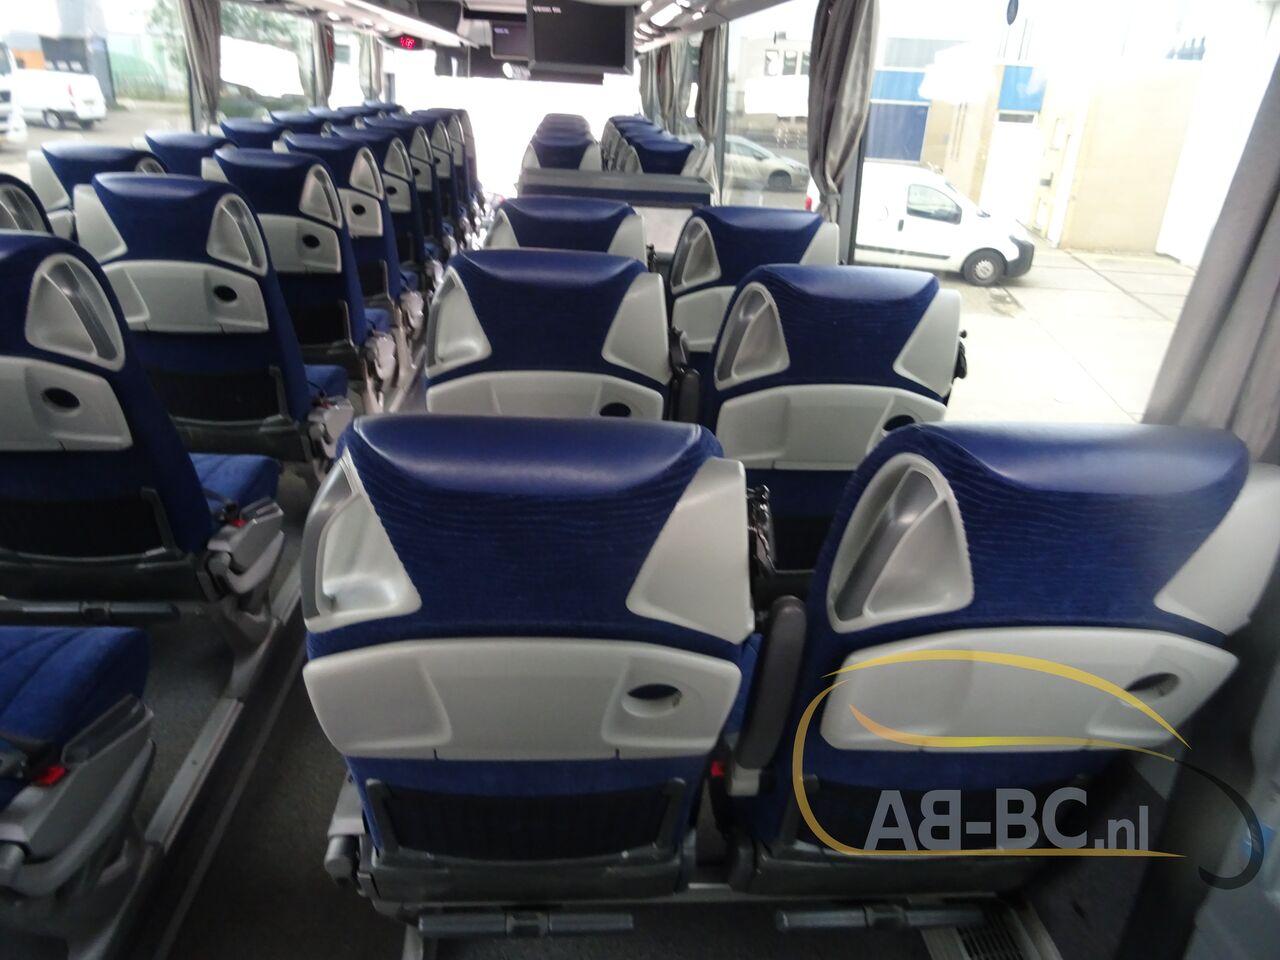 coach-busSETRA-S415-GT-HD-FINAL-EDITION---1627457311237393820_big_4f500ee35011cdd7a2c8ac663725c2e4--21050713010665719300